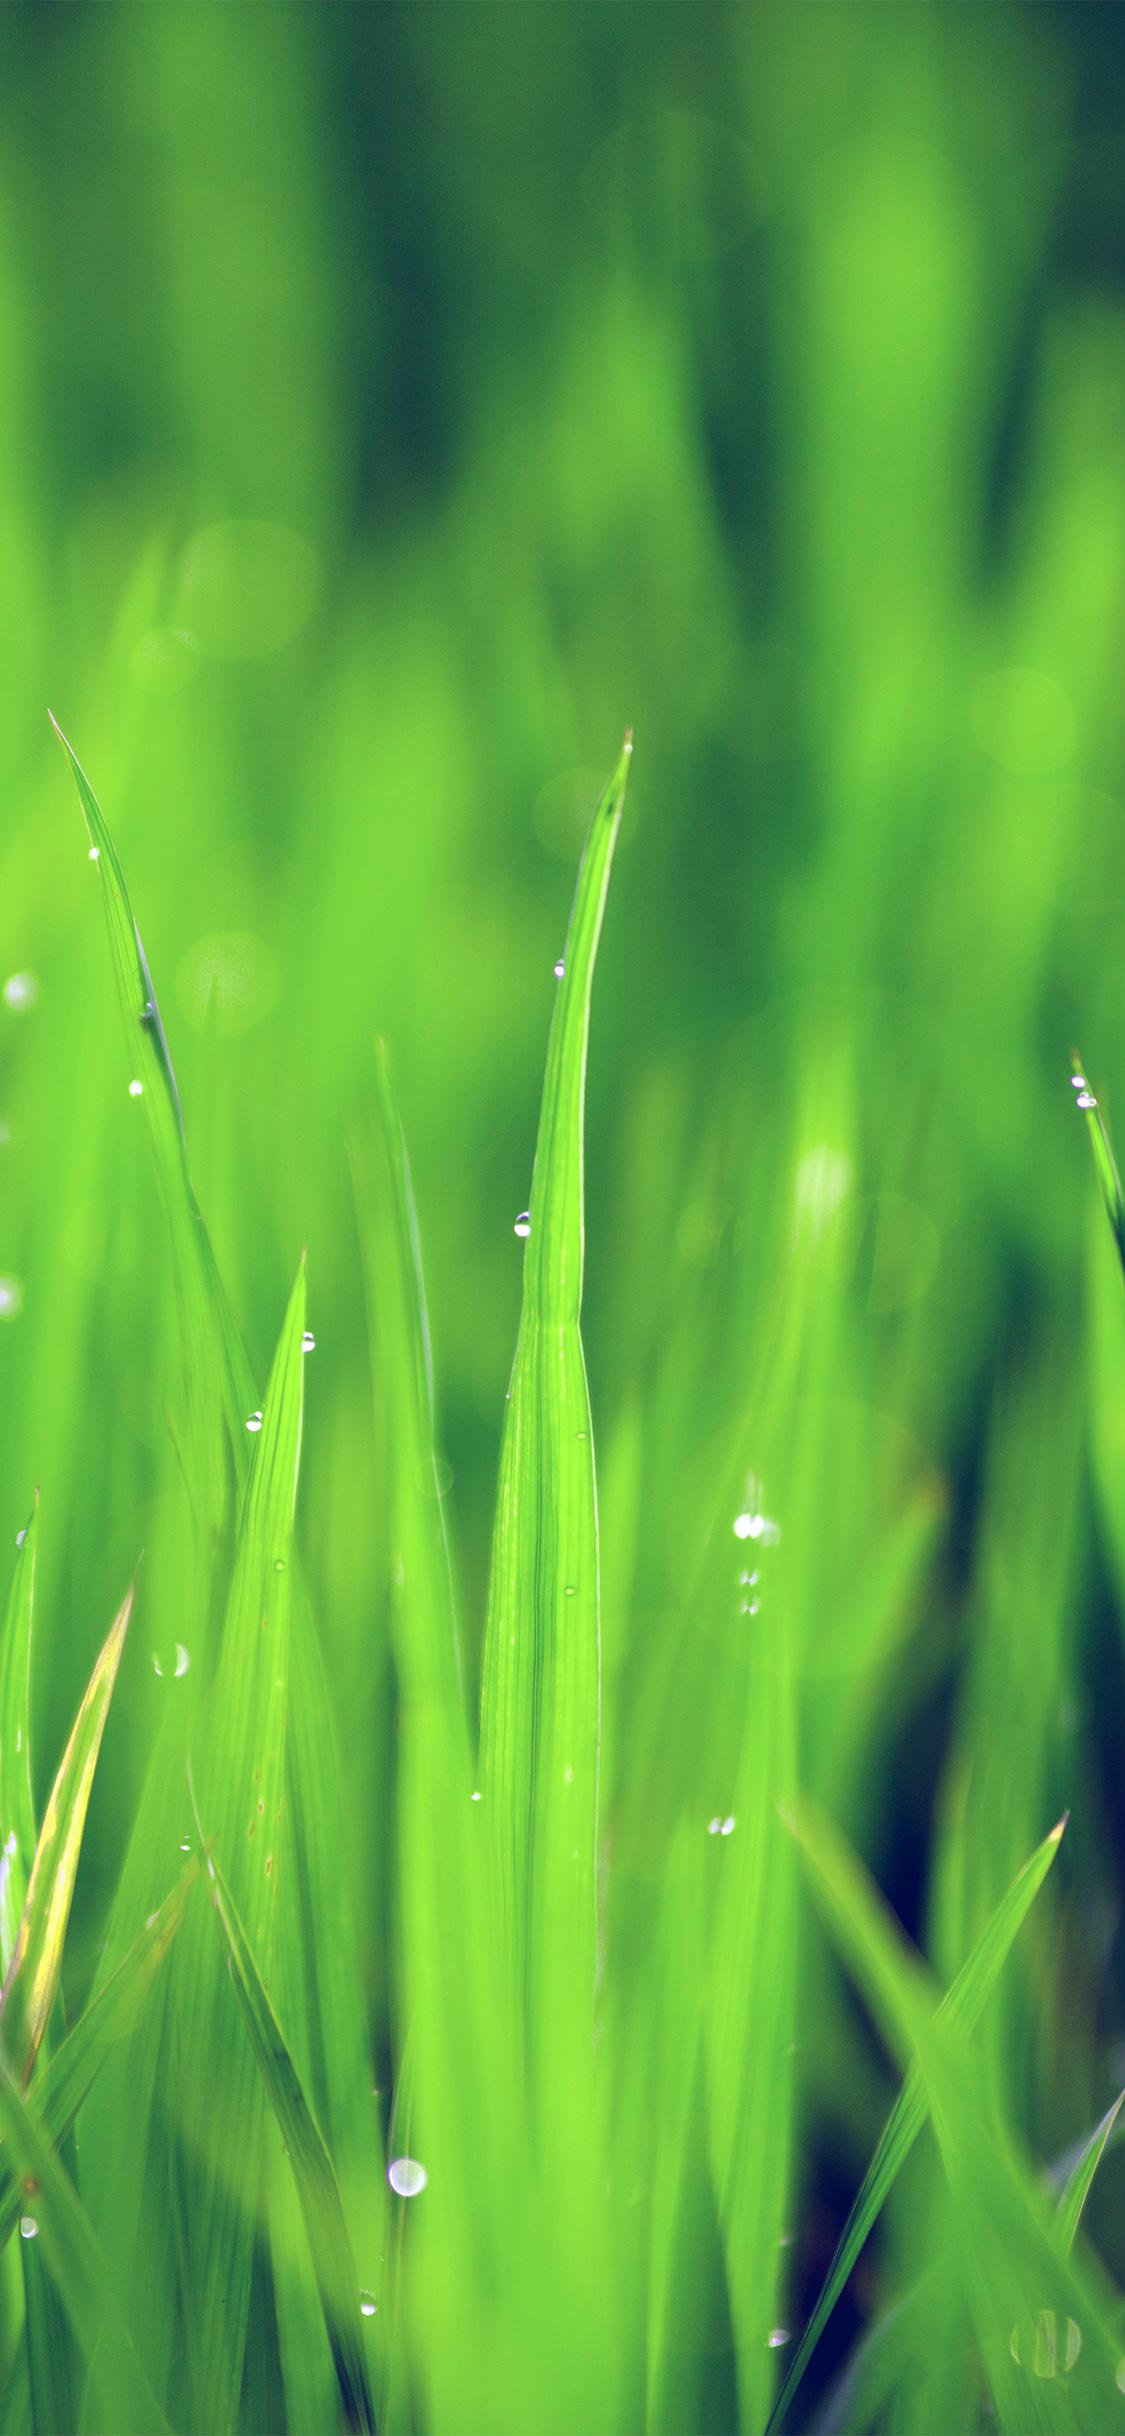 iPhonexpapers.com-Apple-iPhone-wallpaper-nk14-lawn-flower-rain-bokeh-green-blue